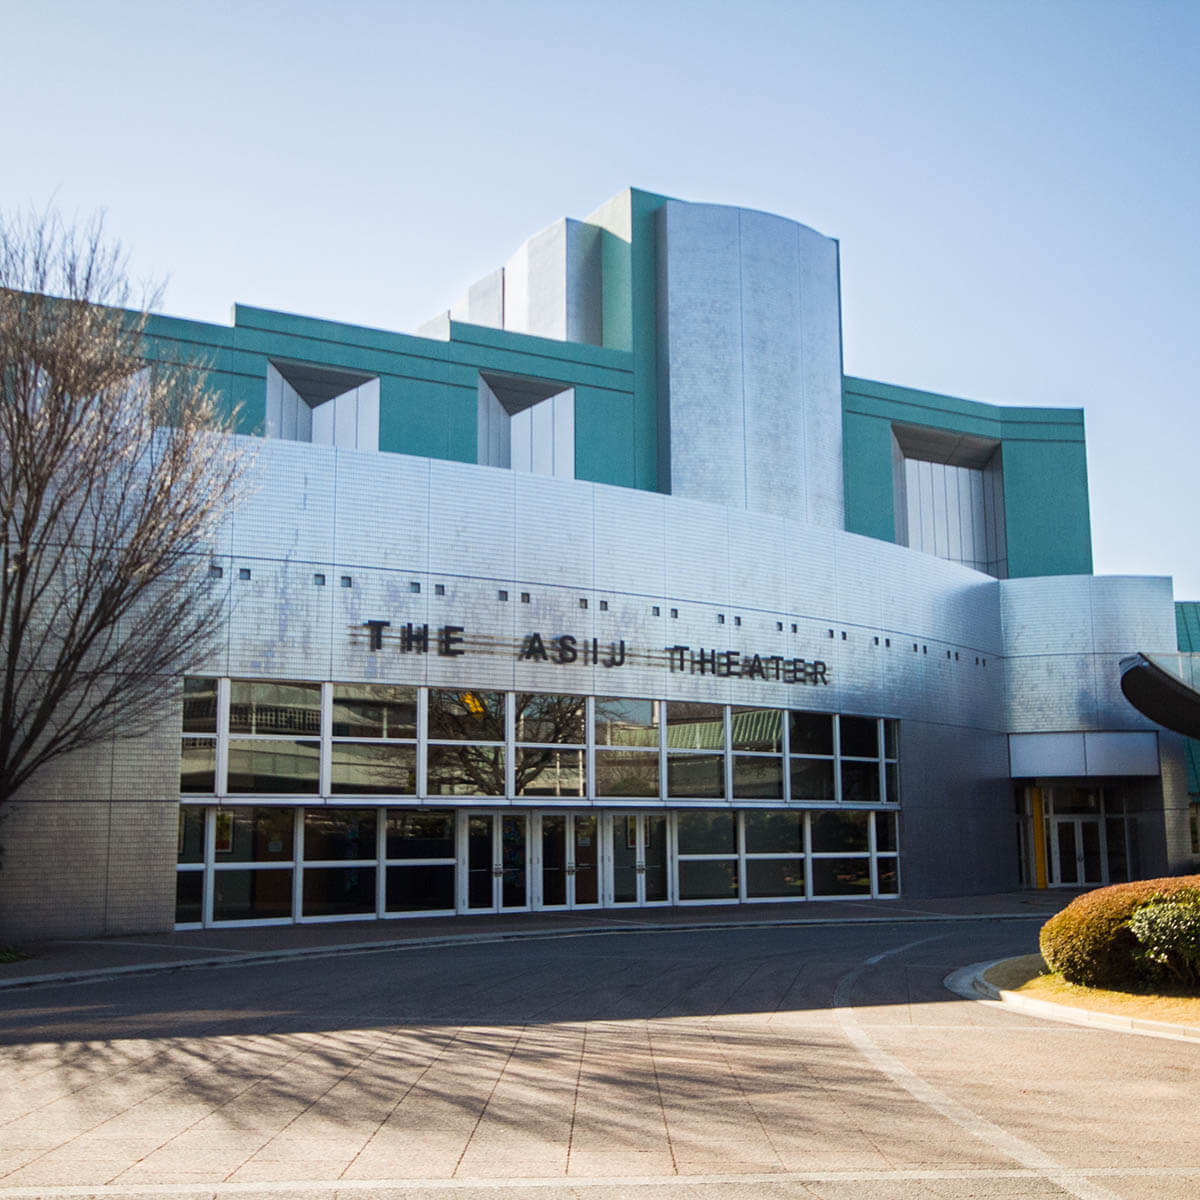 The ASIJ Theater